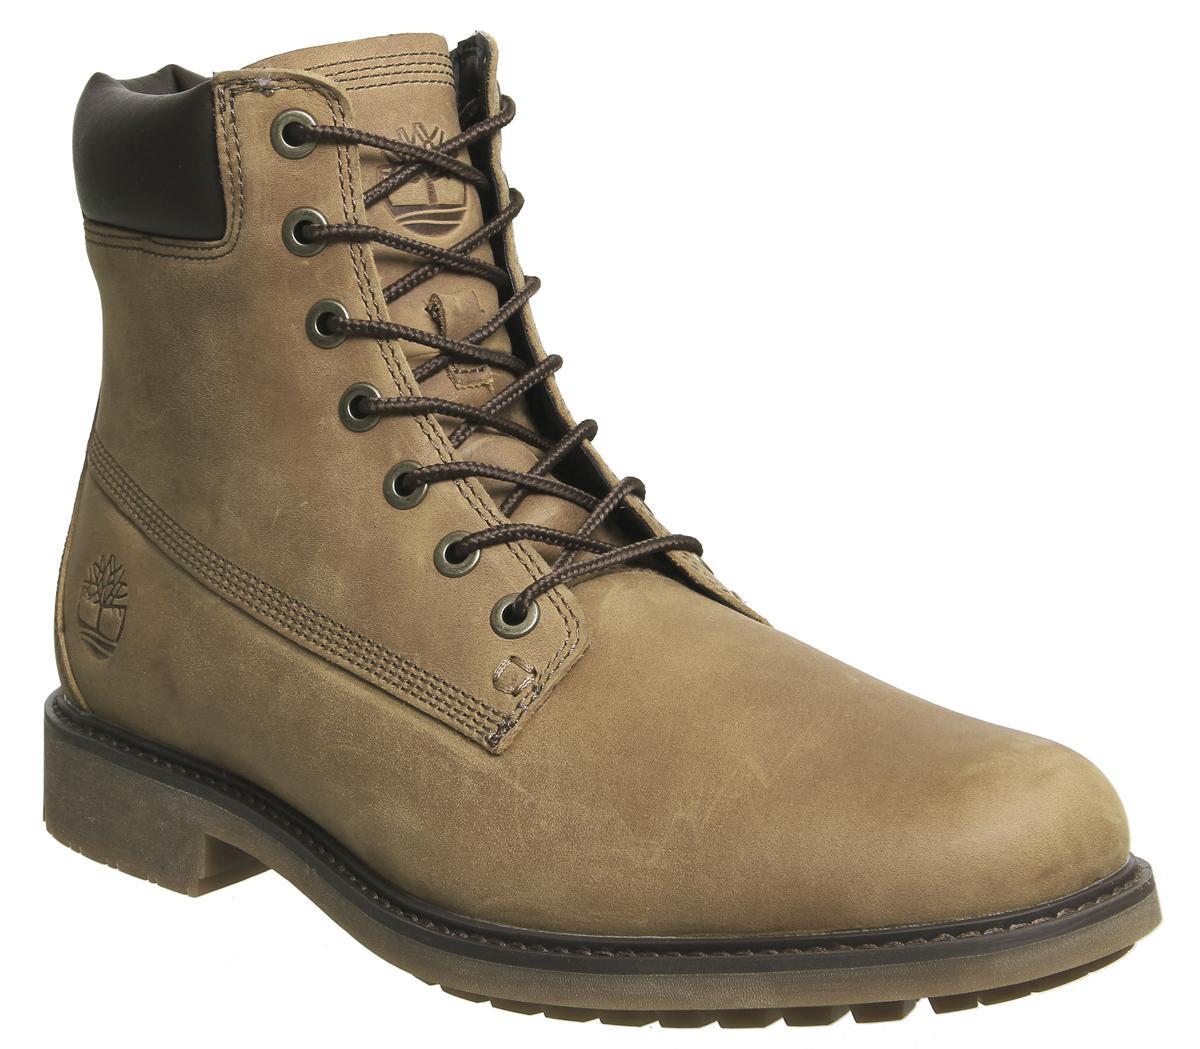 Mens Slim 6 Inch Boots